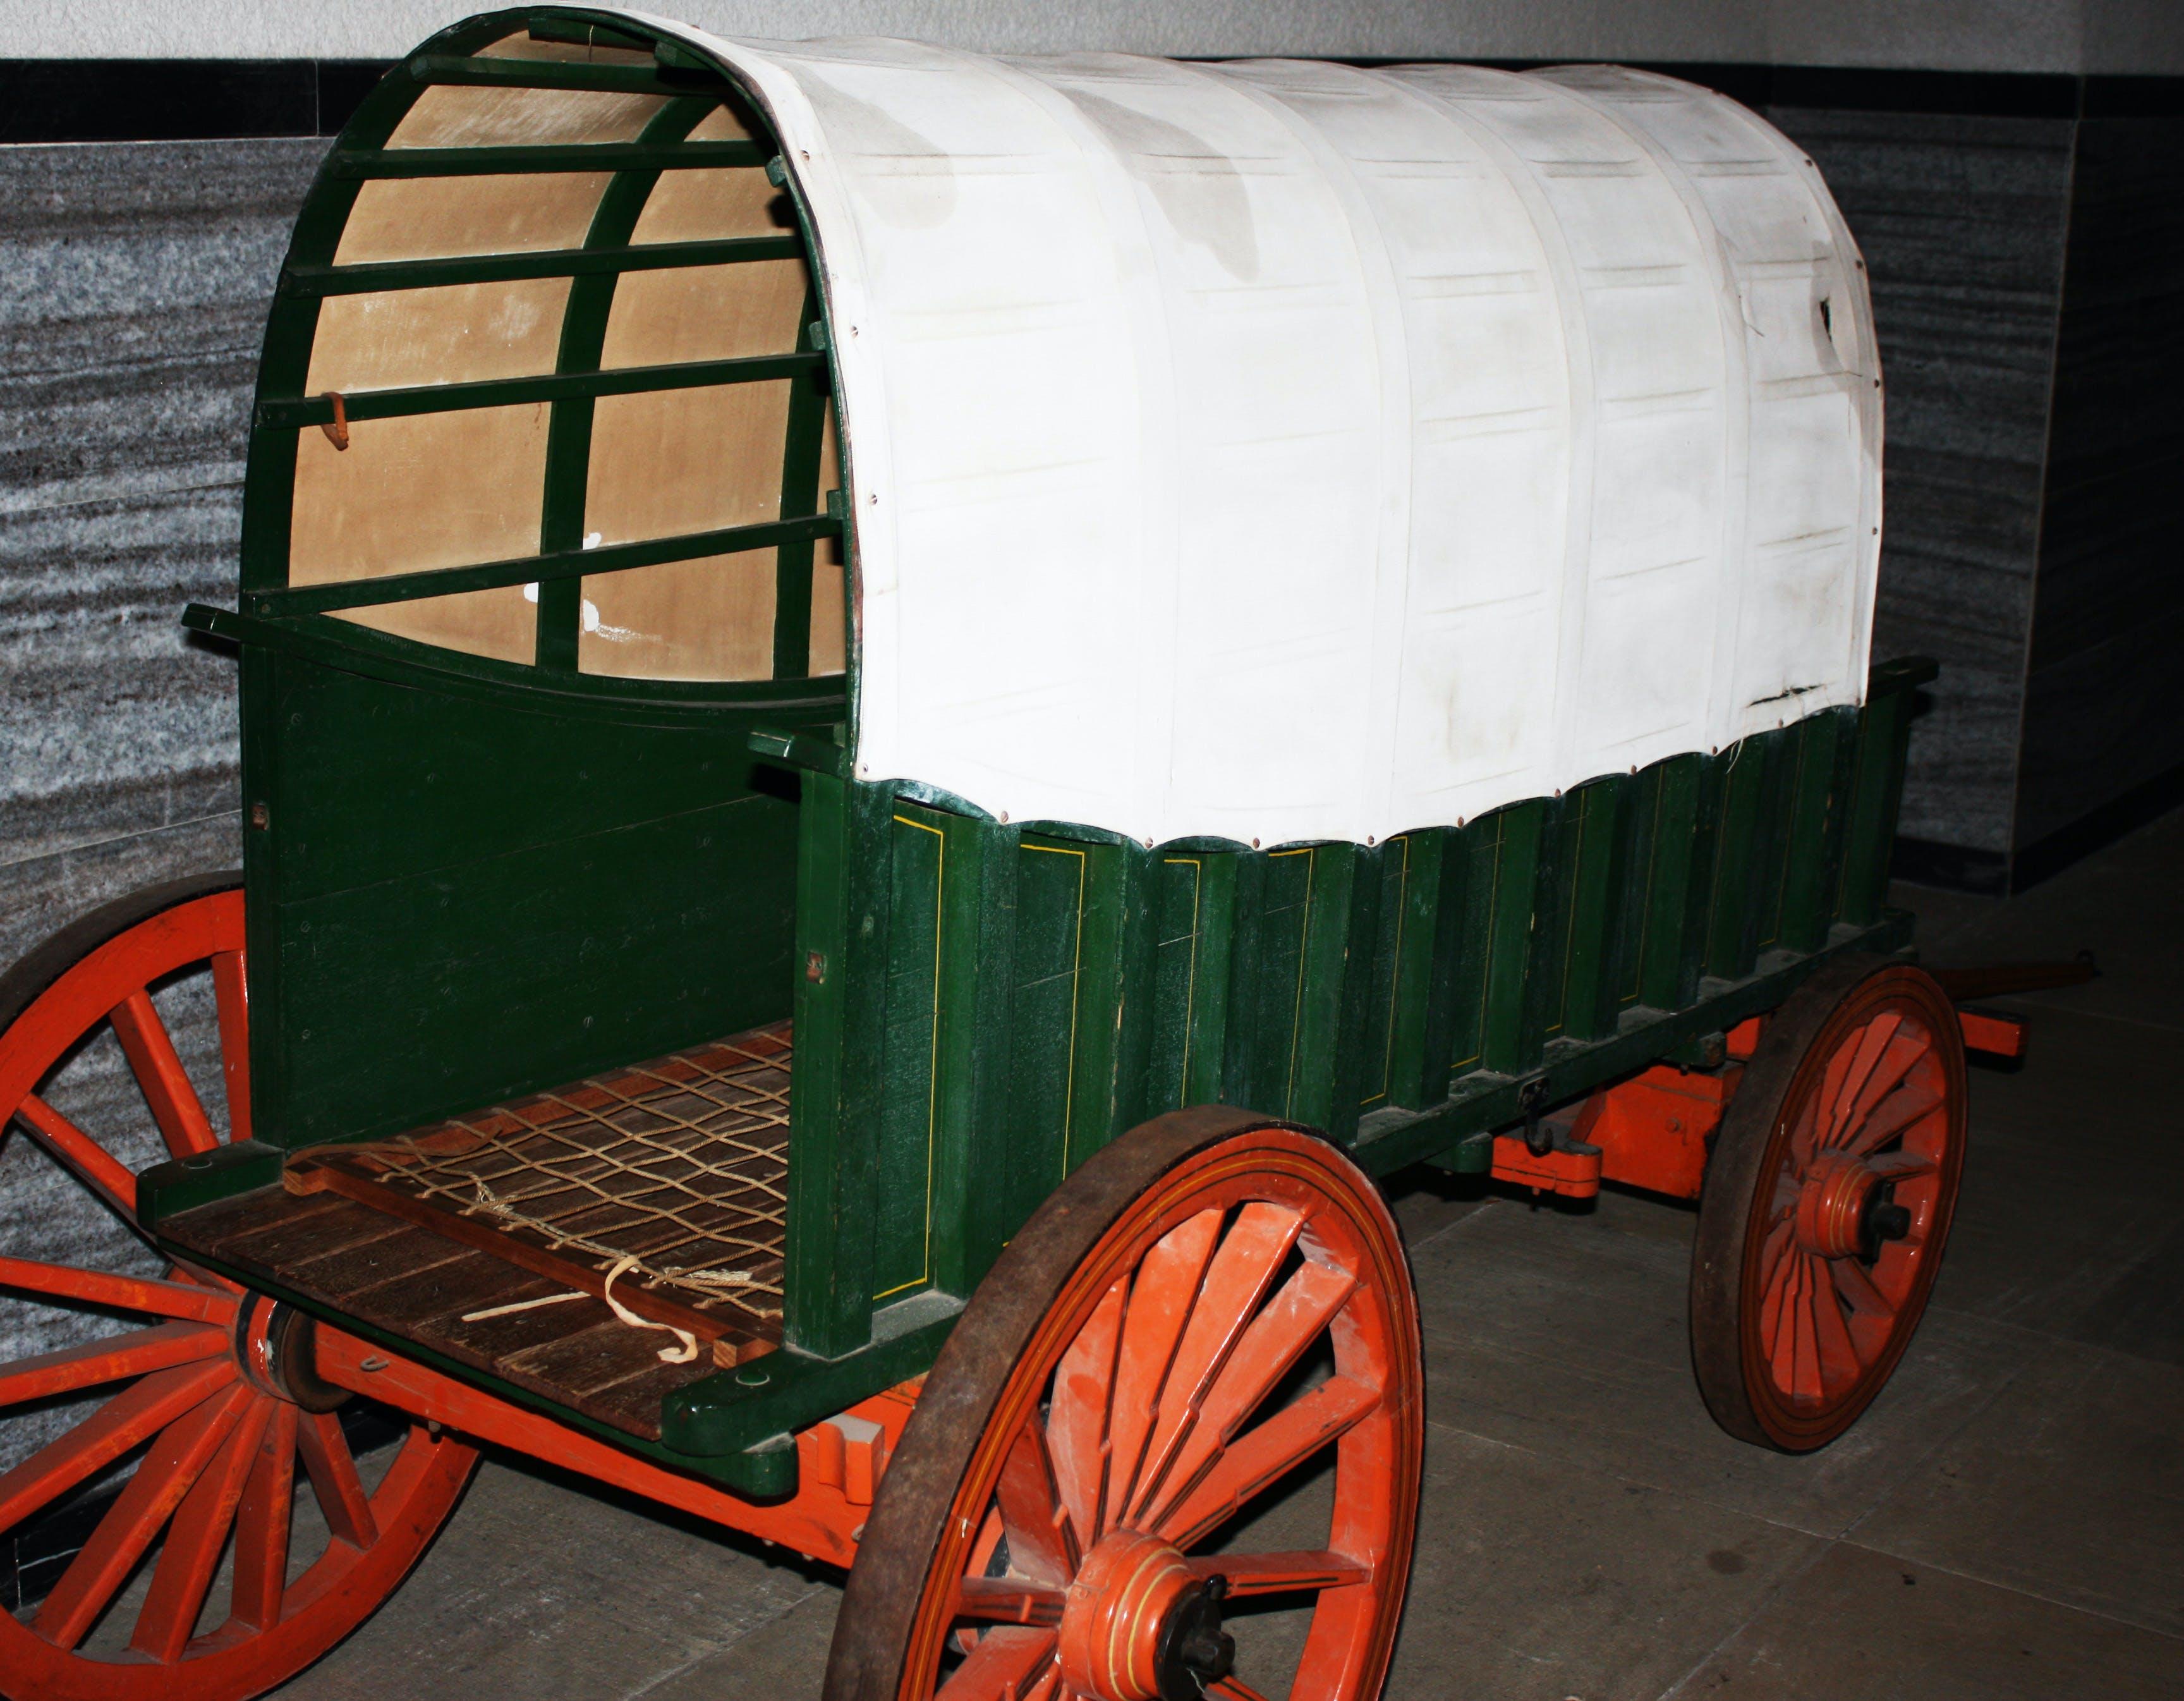 Free stock photo of landmark, vehicle, vintage, wooden